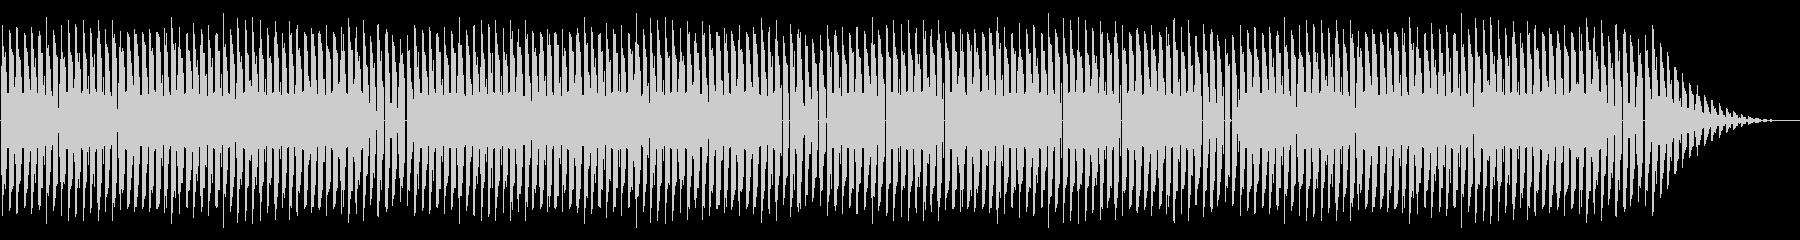 NES 和風 A05-1(ボス) の未再生の波形